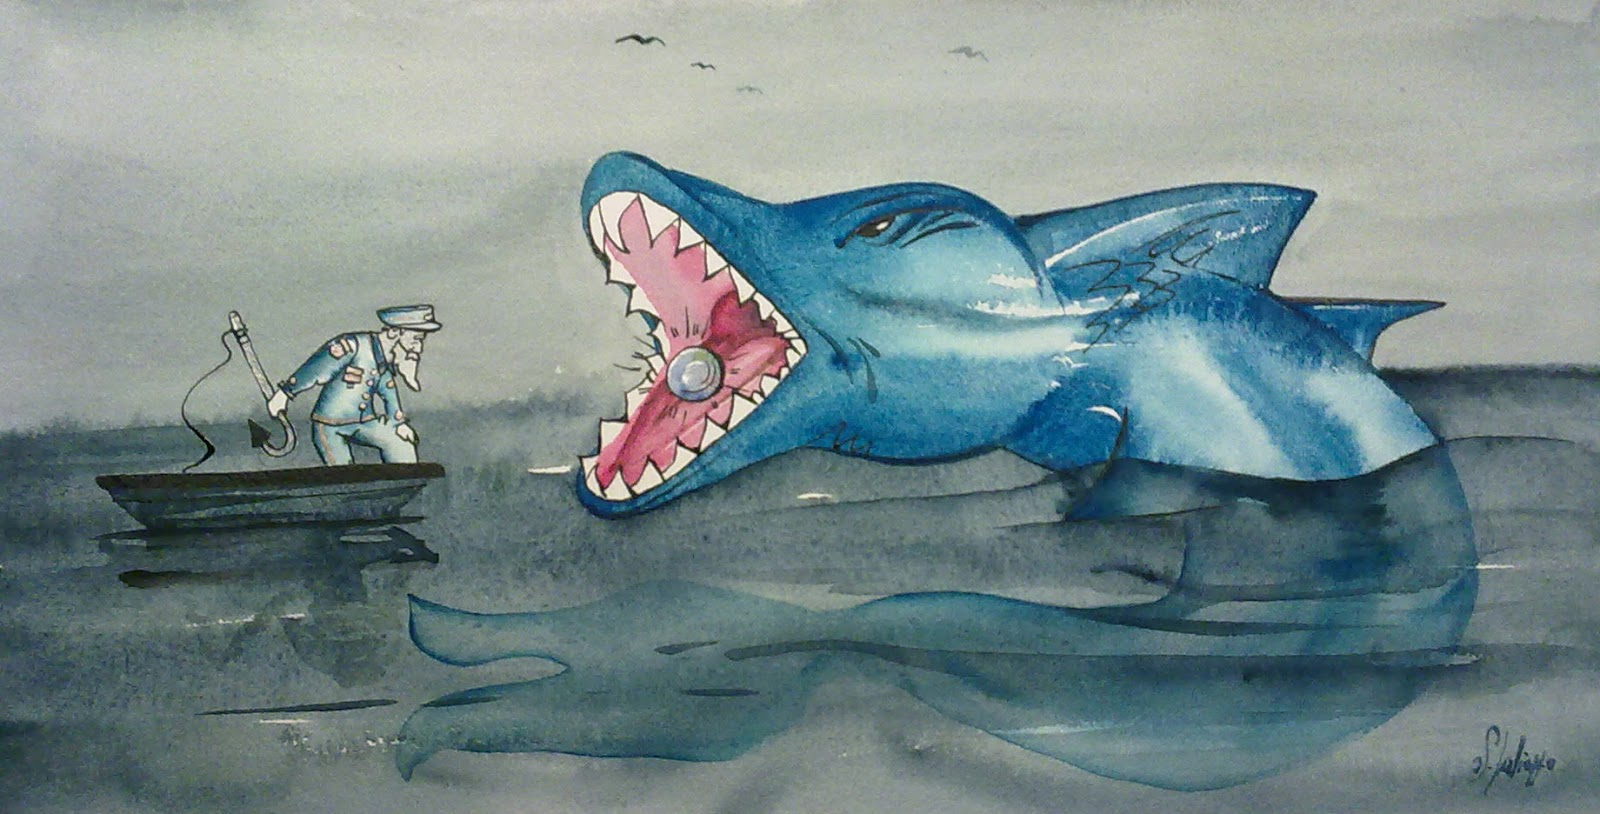 IlColombre by lefavoledellanima.blogspot.com